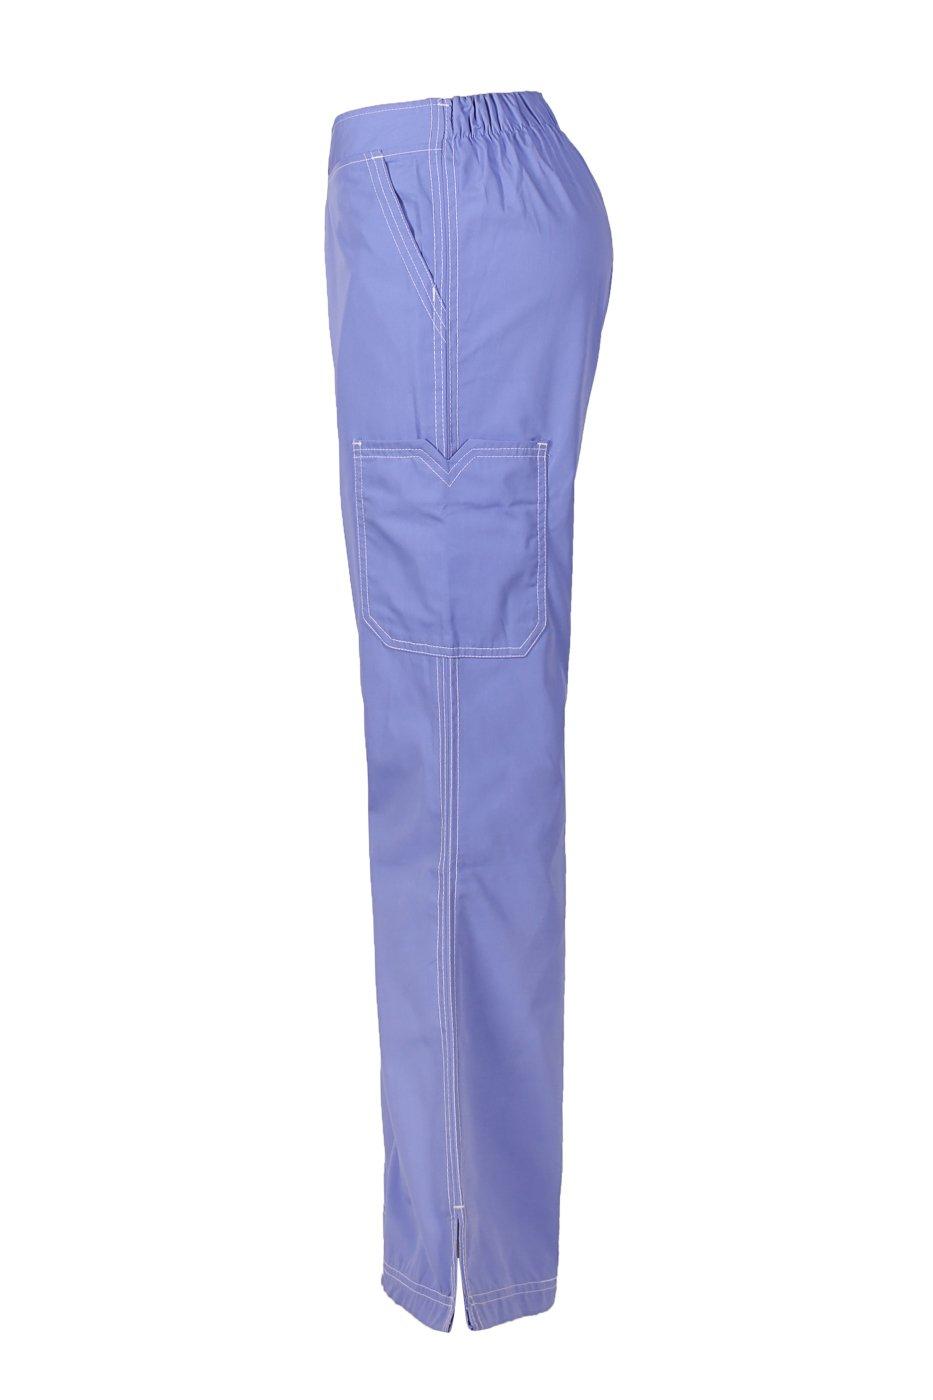 MedPro Women's Medical Scrub Set (Top & Bottom) Royal Blue XXL (5666)